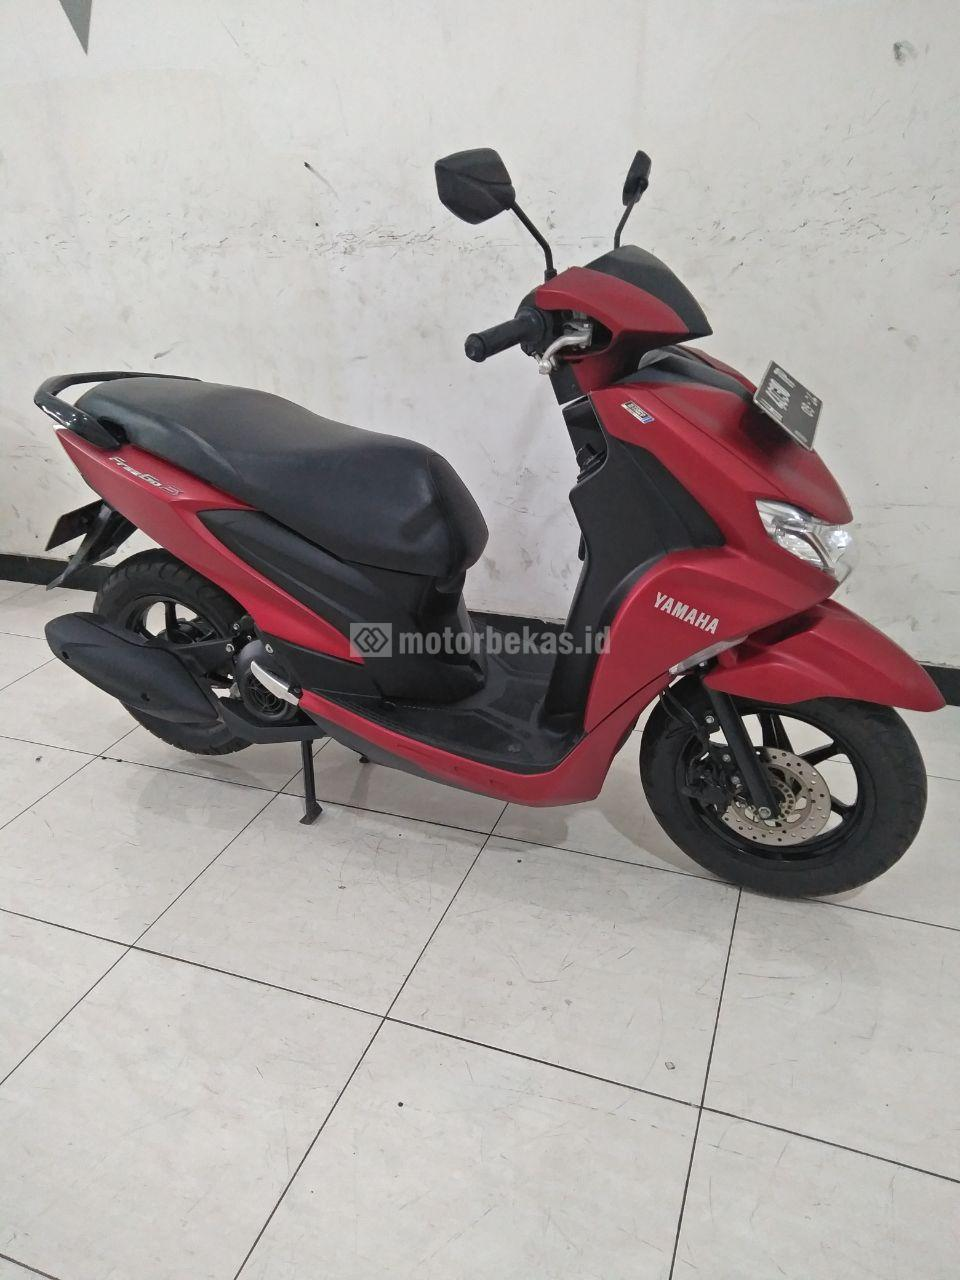 YAMAHA FREE GO S  4306 motorbekas.id